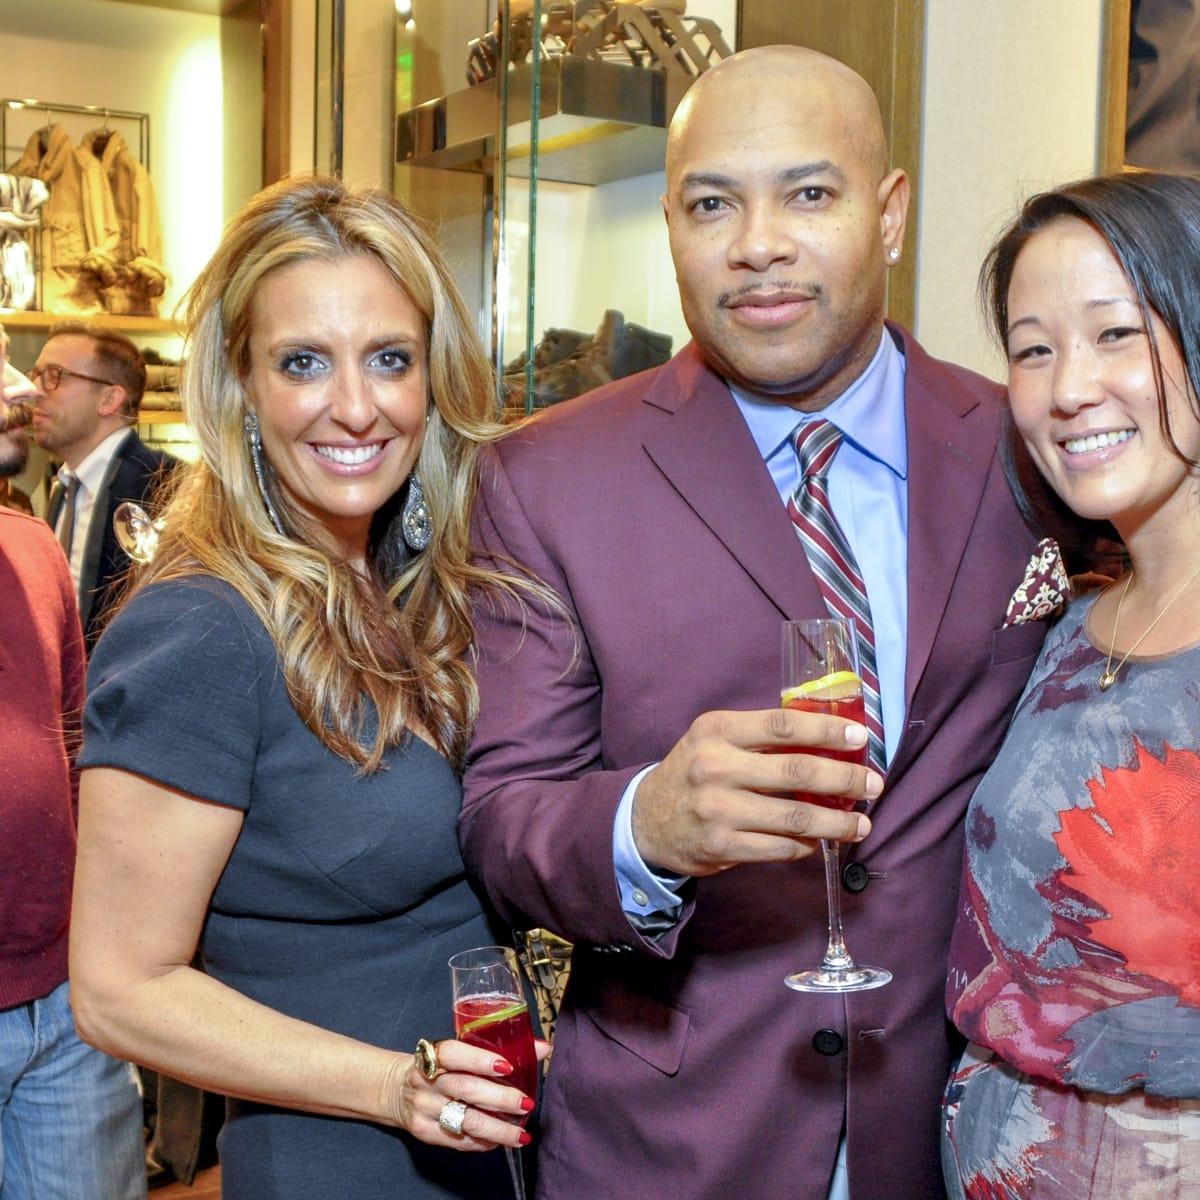 07, Andre Johnson/Burberry, December 2012, Bari Medgaus, Reggie Saunders, Deb Lee